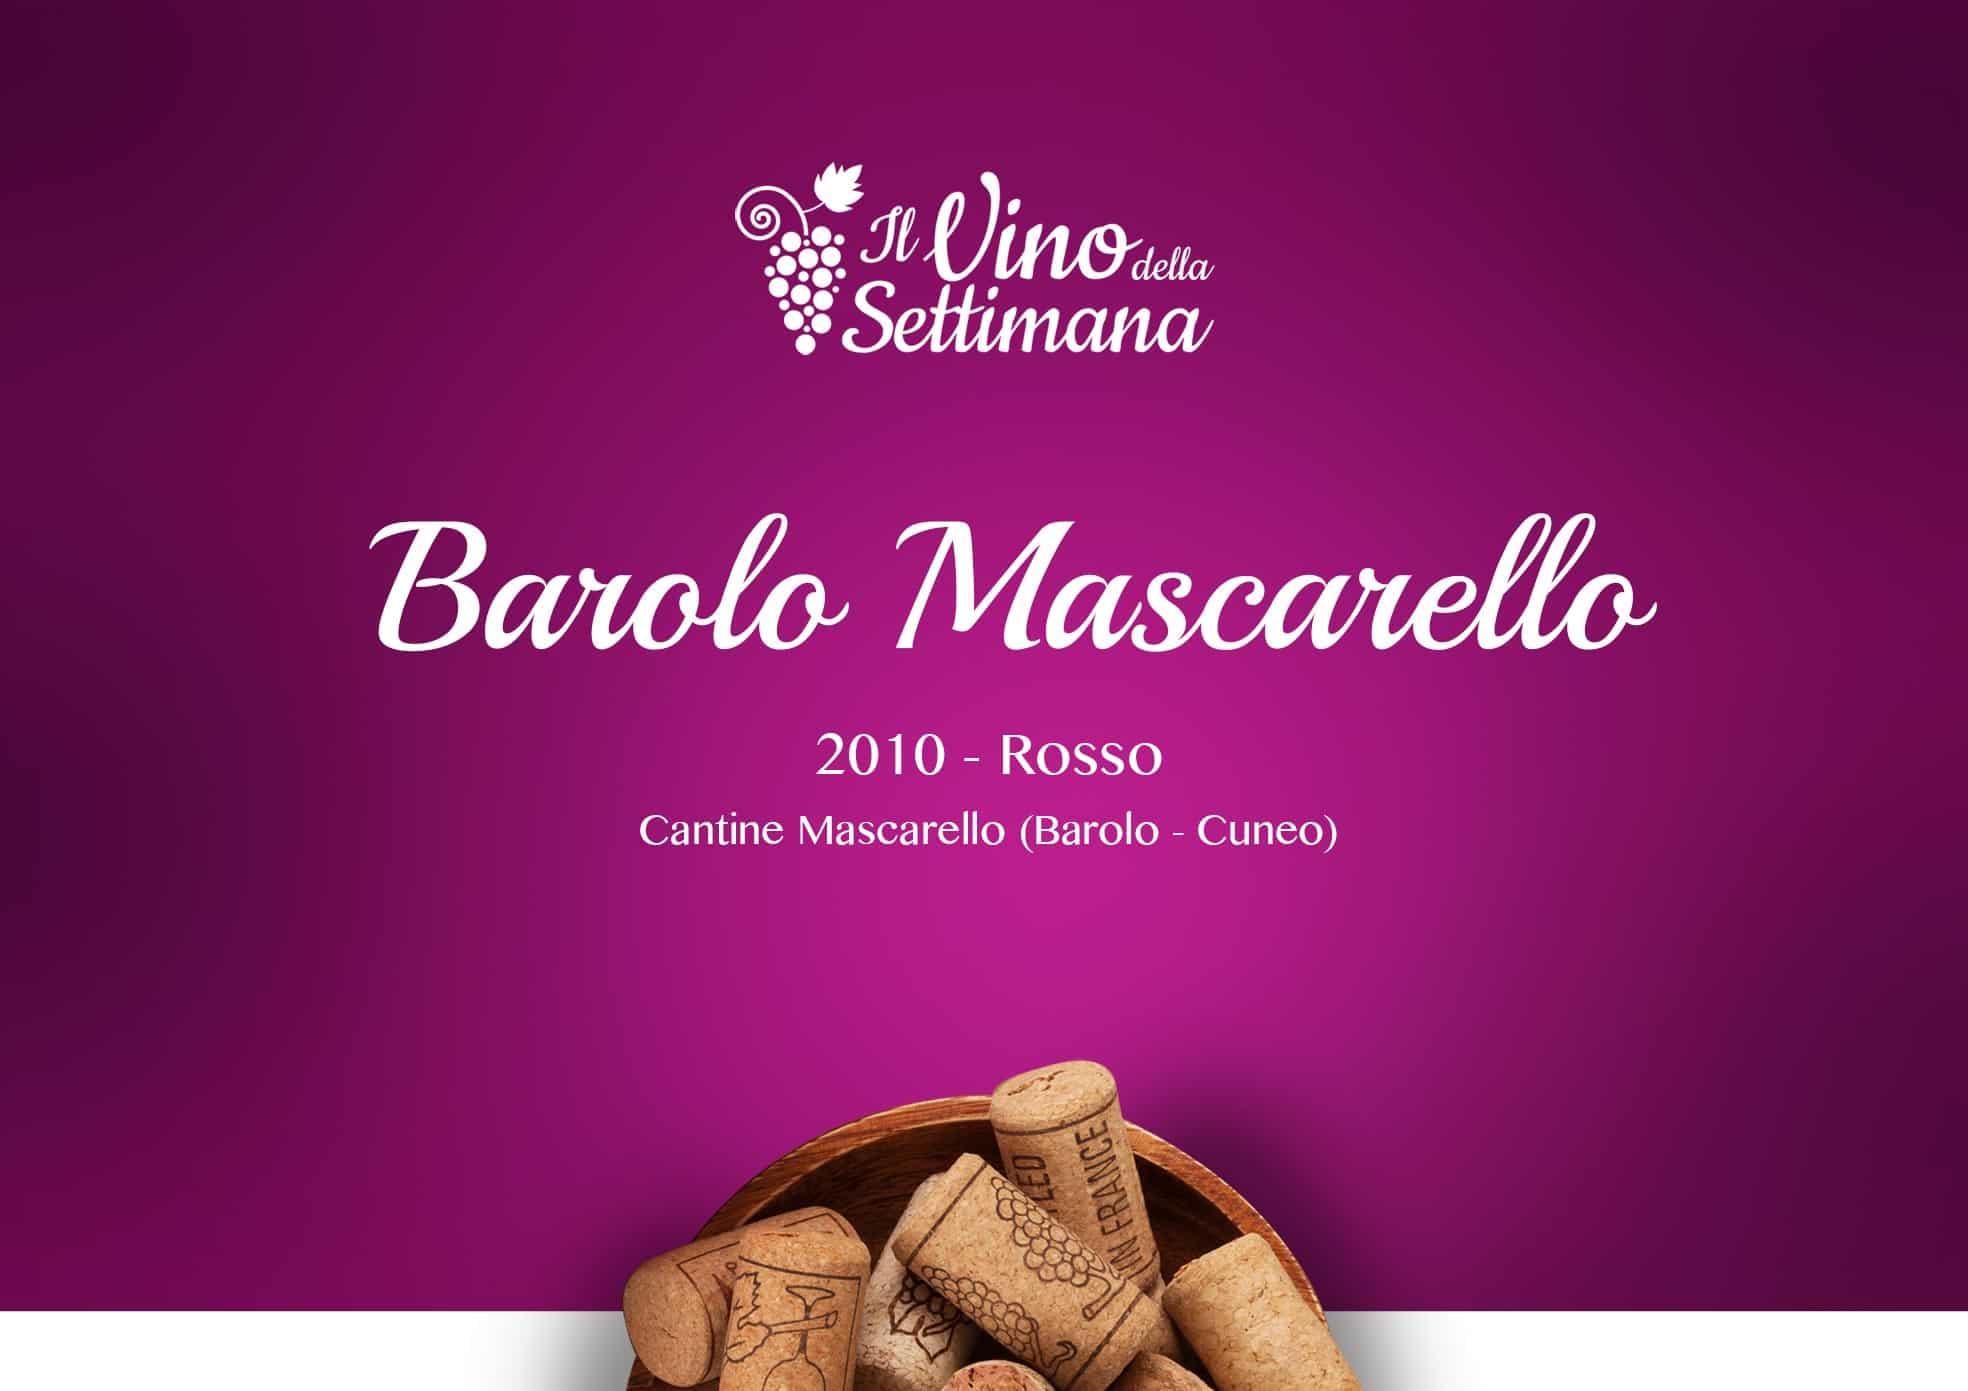 Barolo Mascarello - 2010